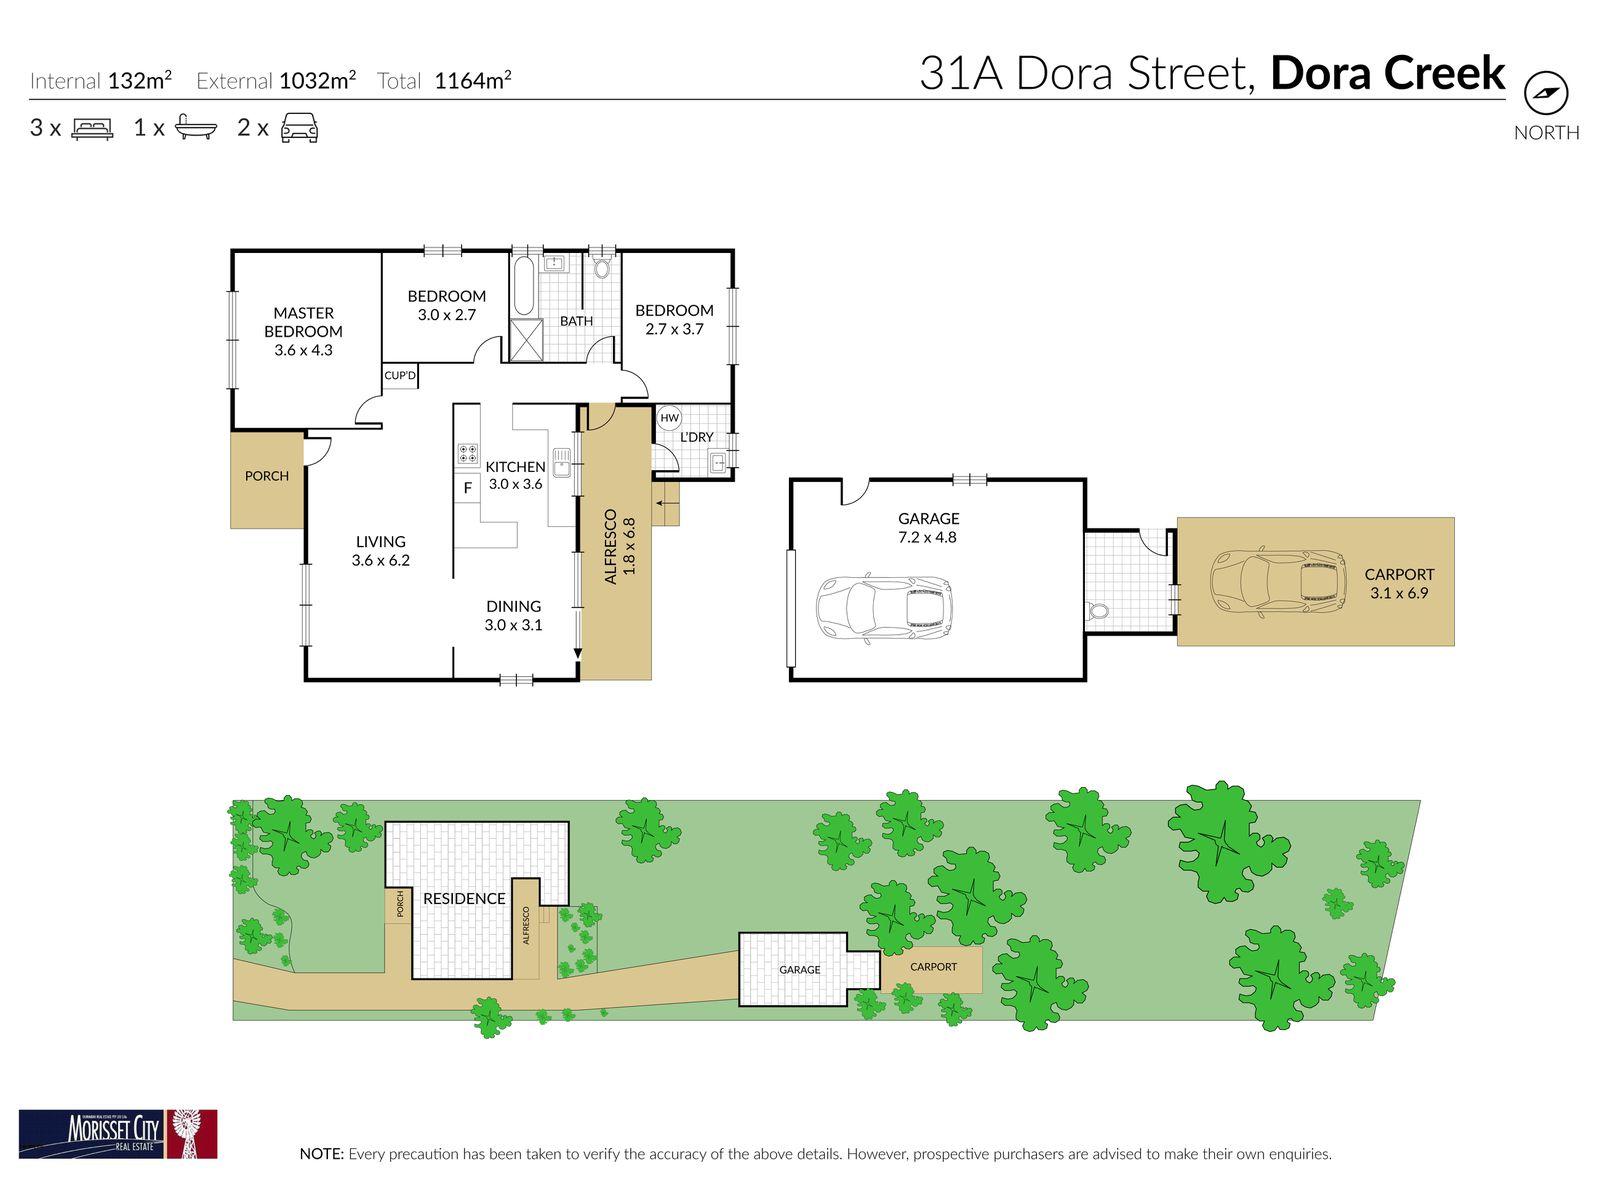 31A Dora Street, Dora Creek